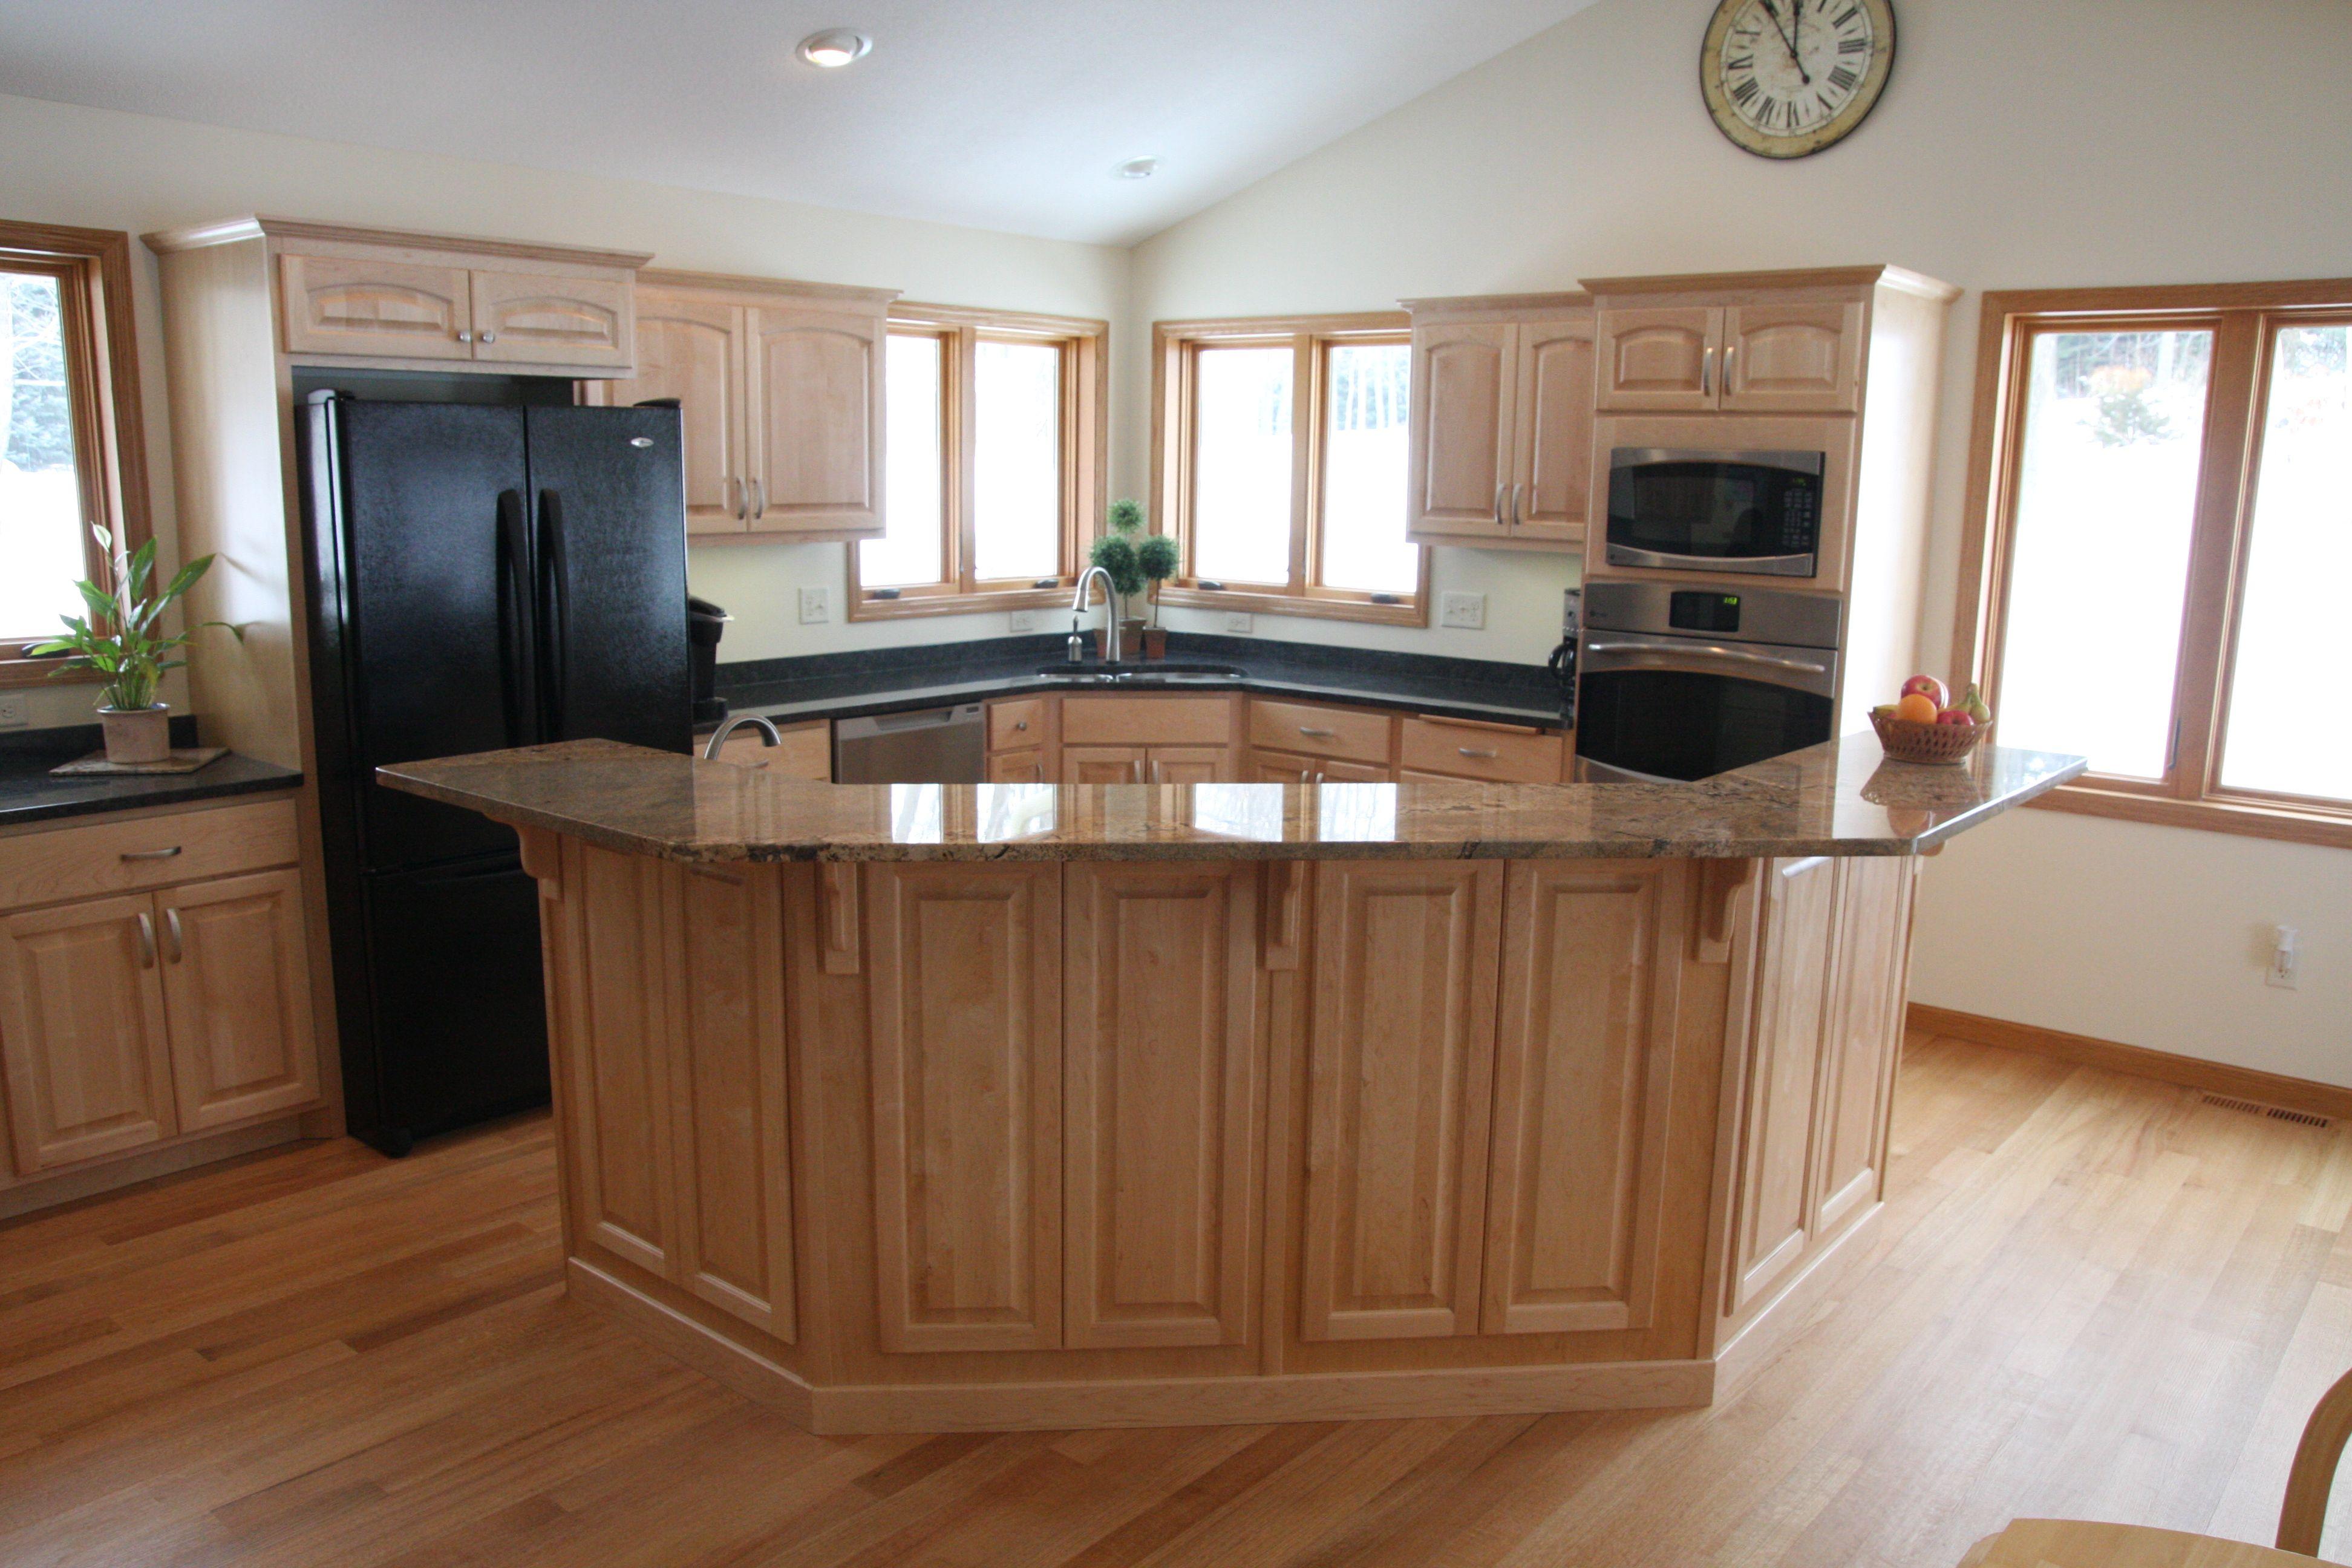 open kitchen floor plan  kitchens  pinterest